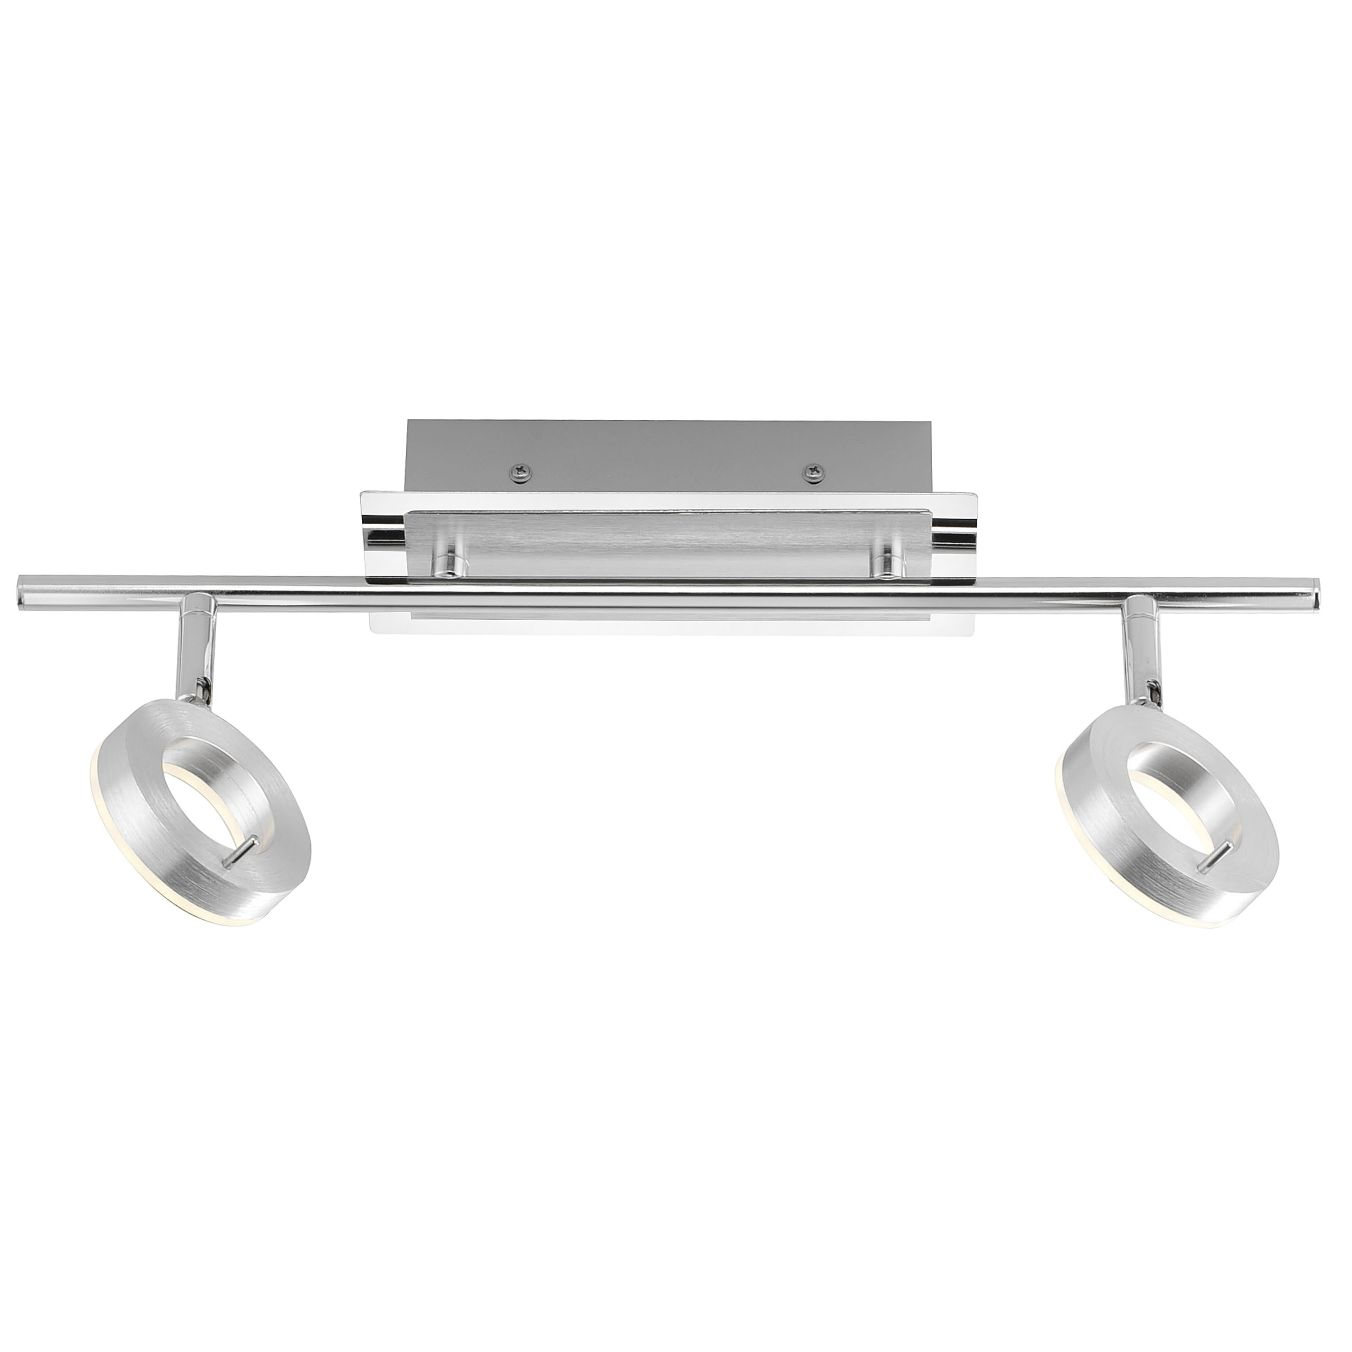 energie  A+, LED-plafondlamp Sileda I - ijzer - 2 lichtbronnen - Aluminiumkleurig, Paul Neuhaus